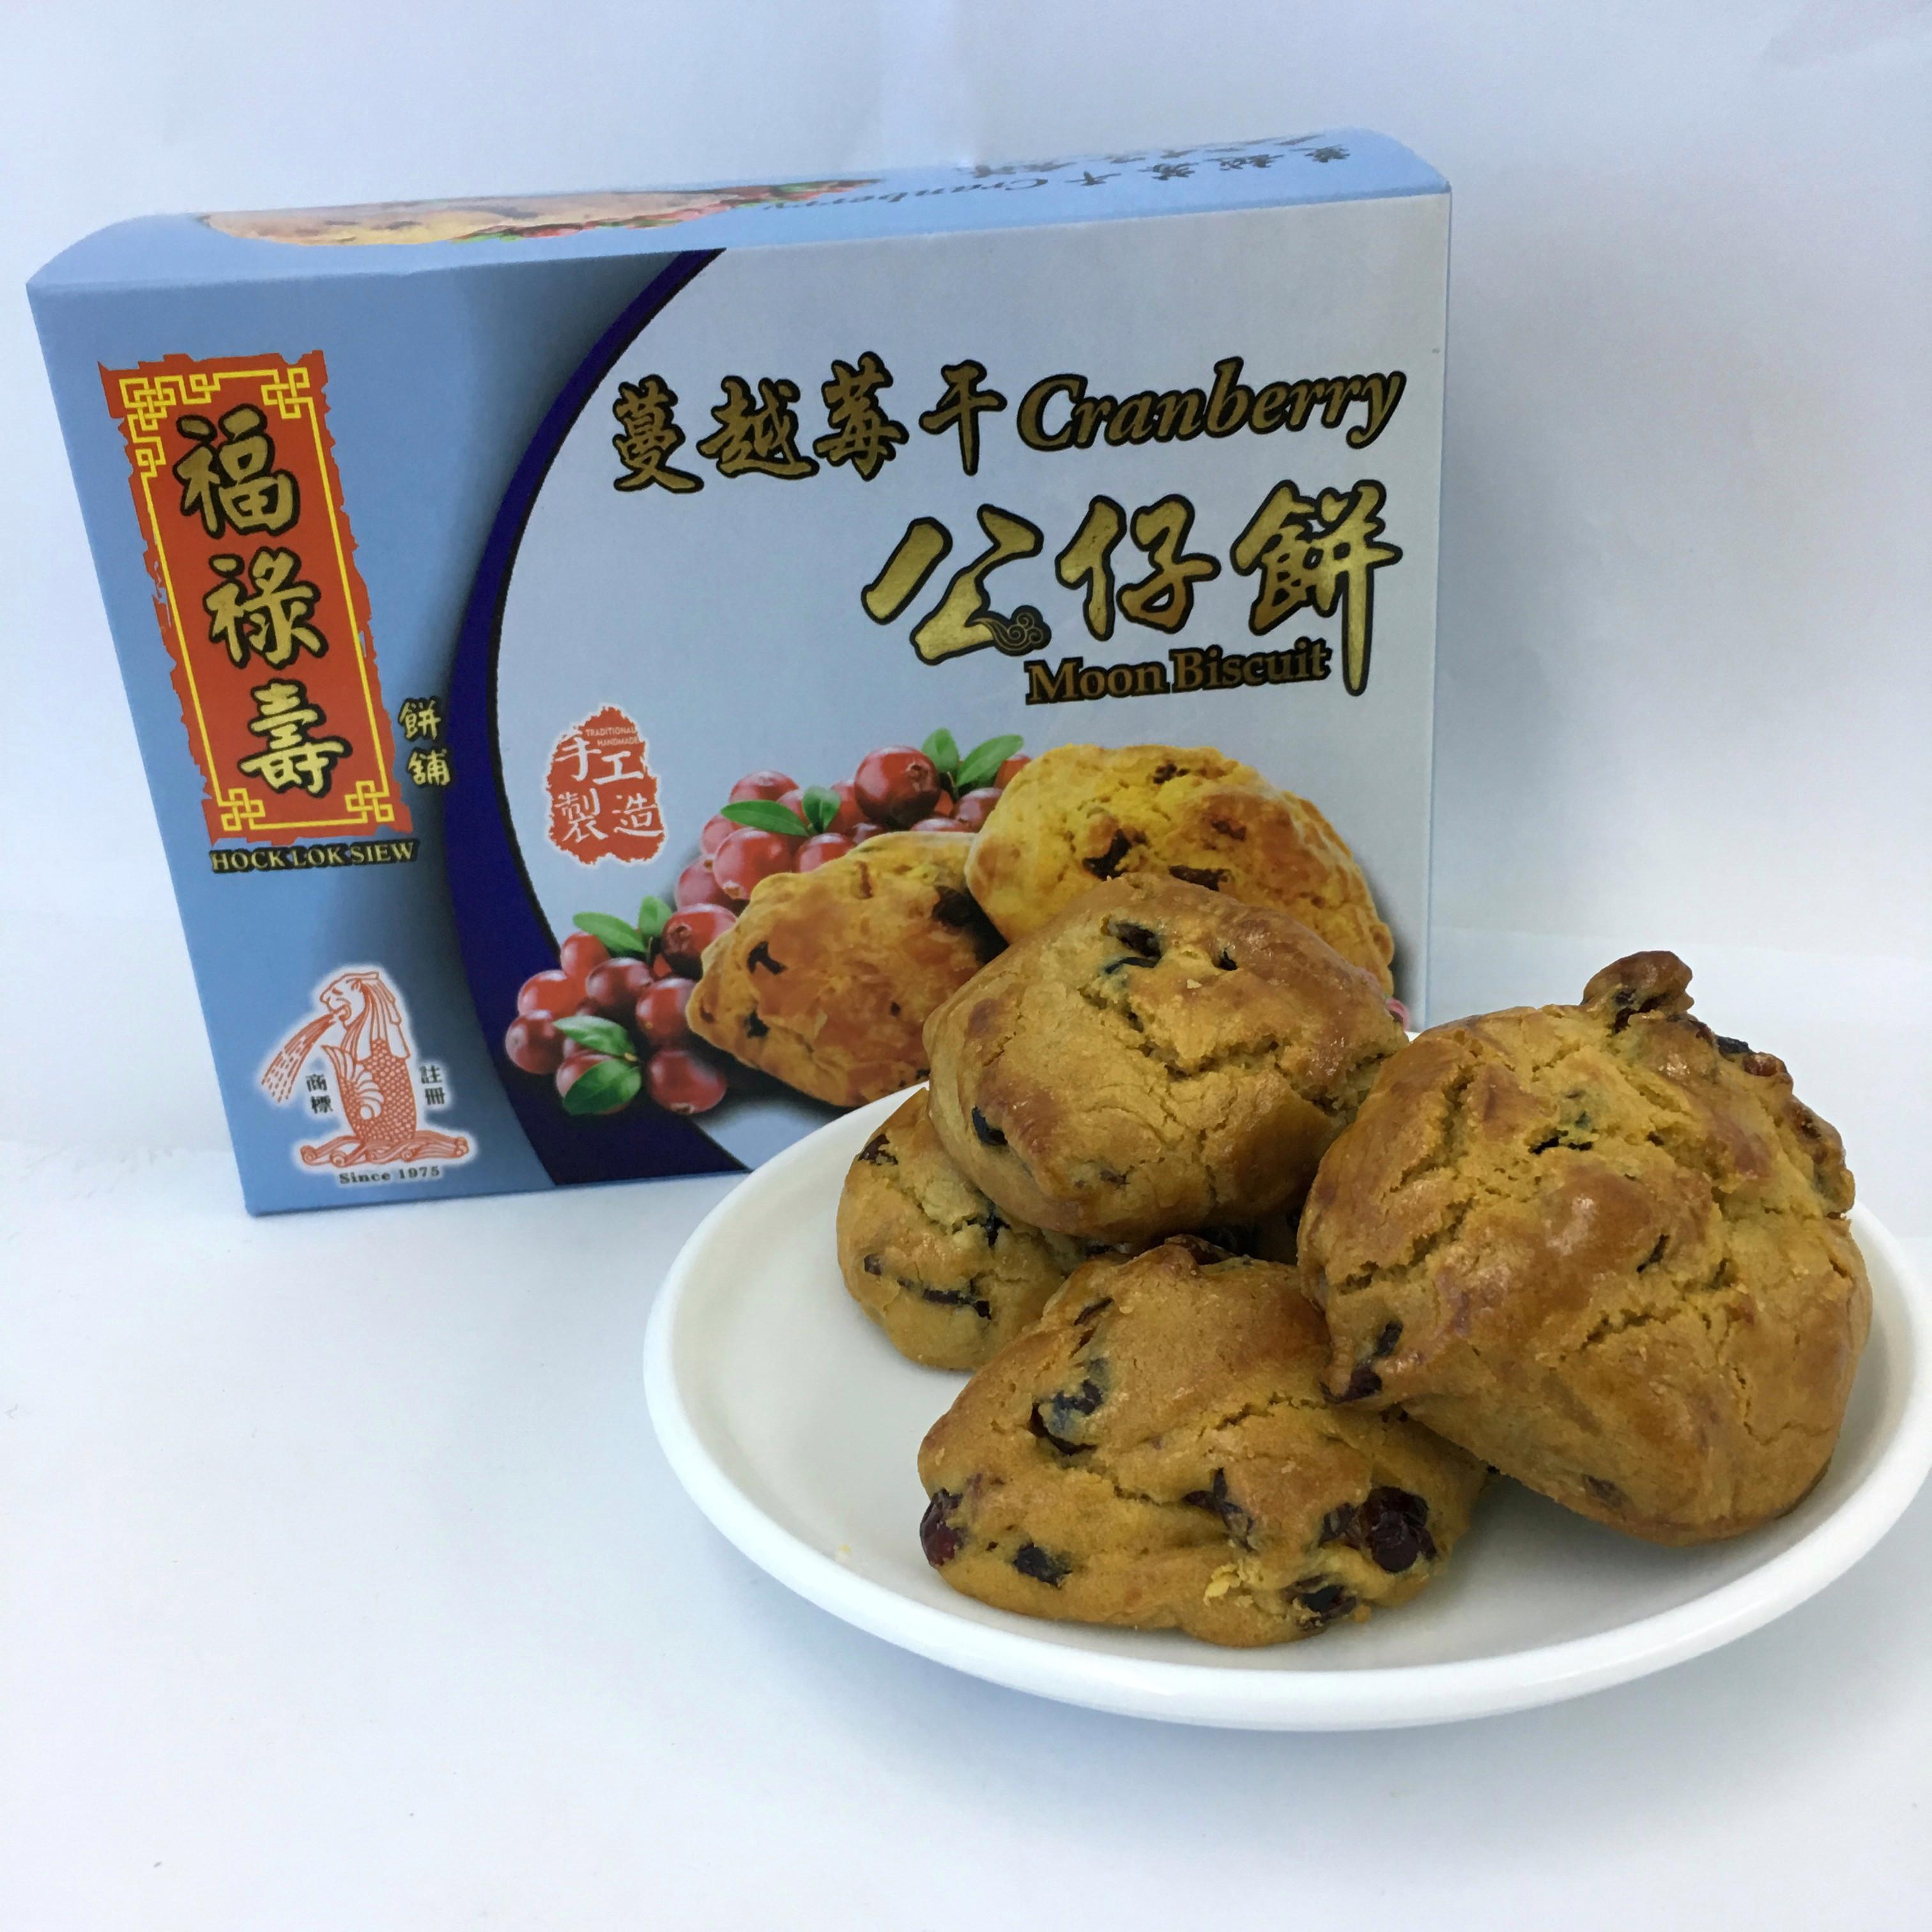 Cranberry Moon Biscuit 蔓越莓干公仔饼